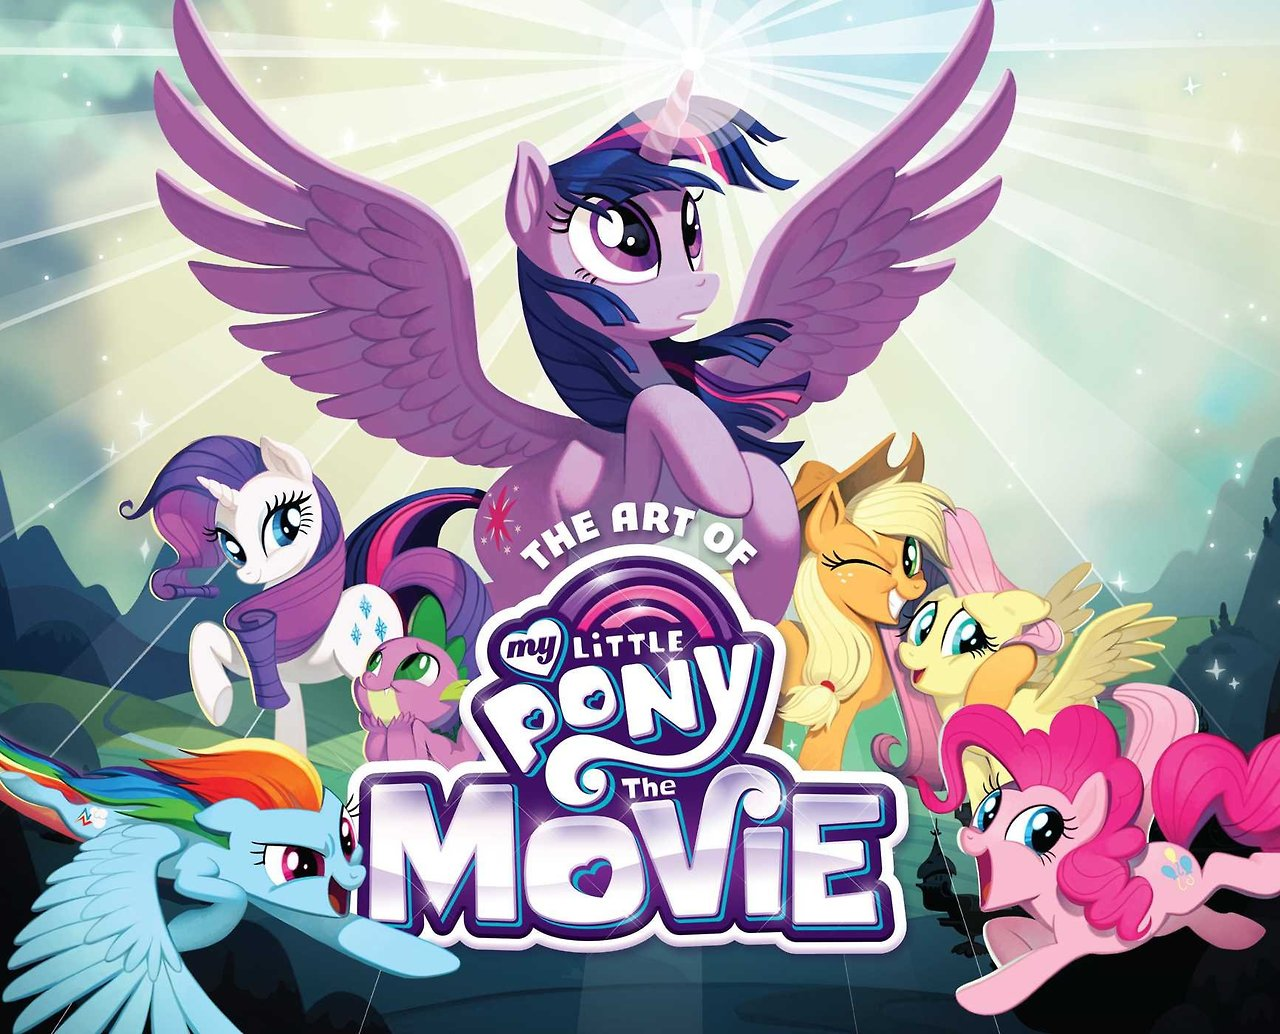 My little pony the movie мультфильм 2018 дата выхода